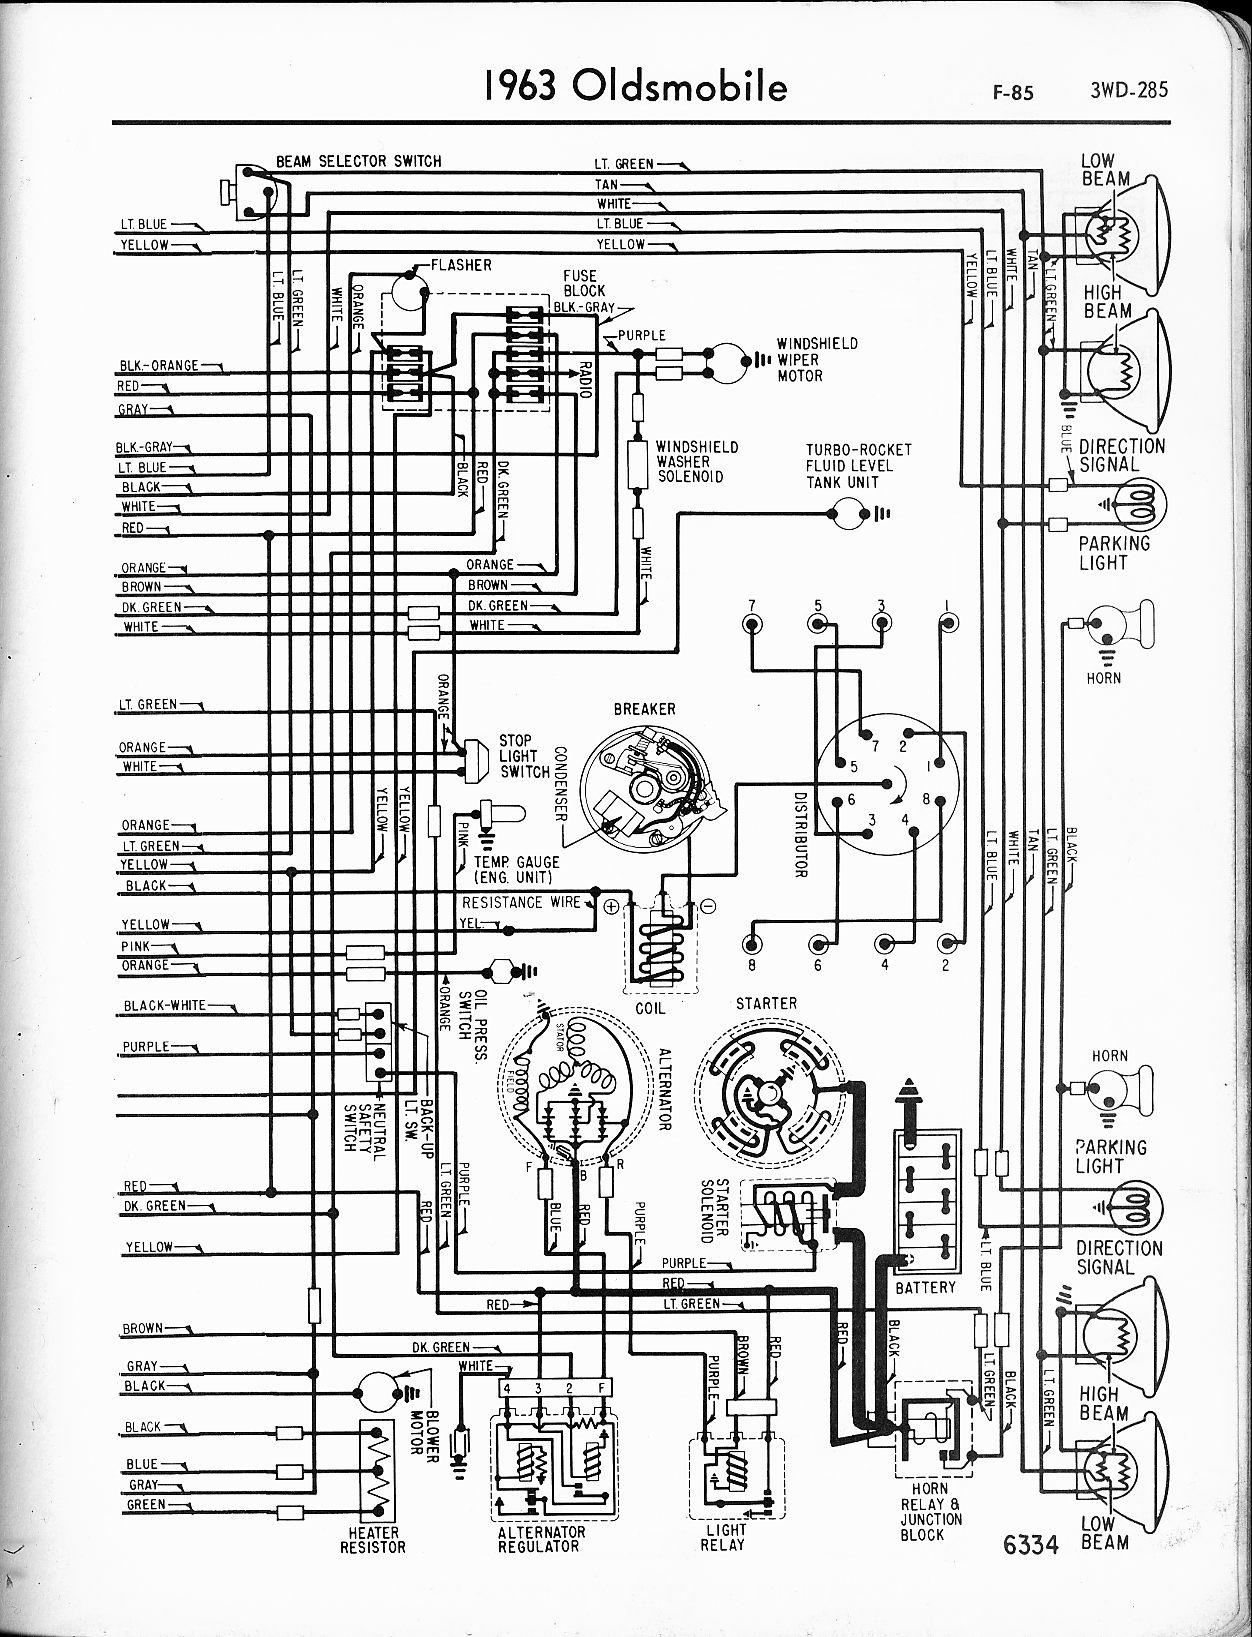 98 dodge neon engine wiring harness